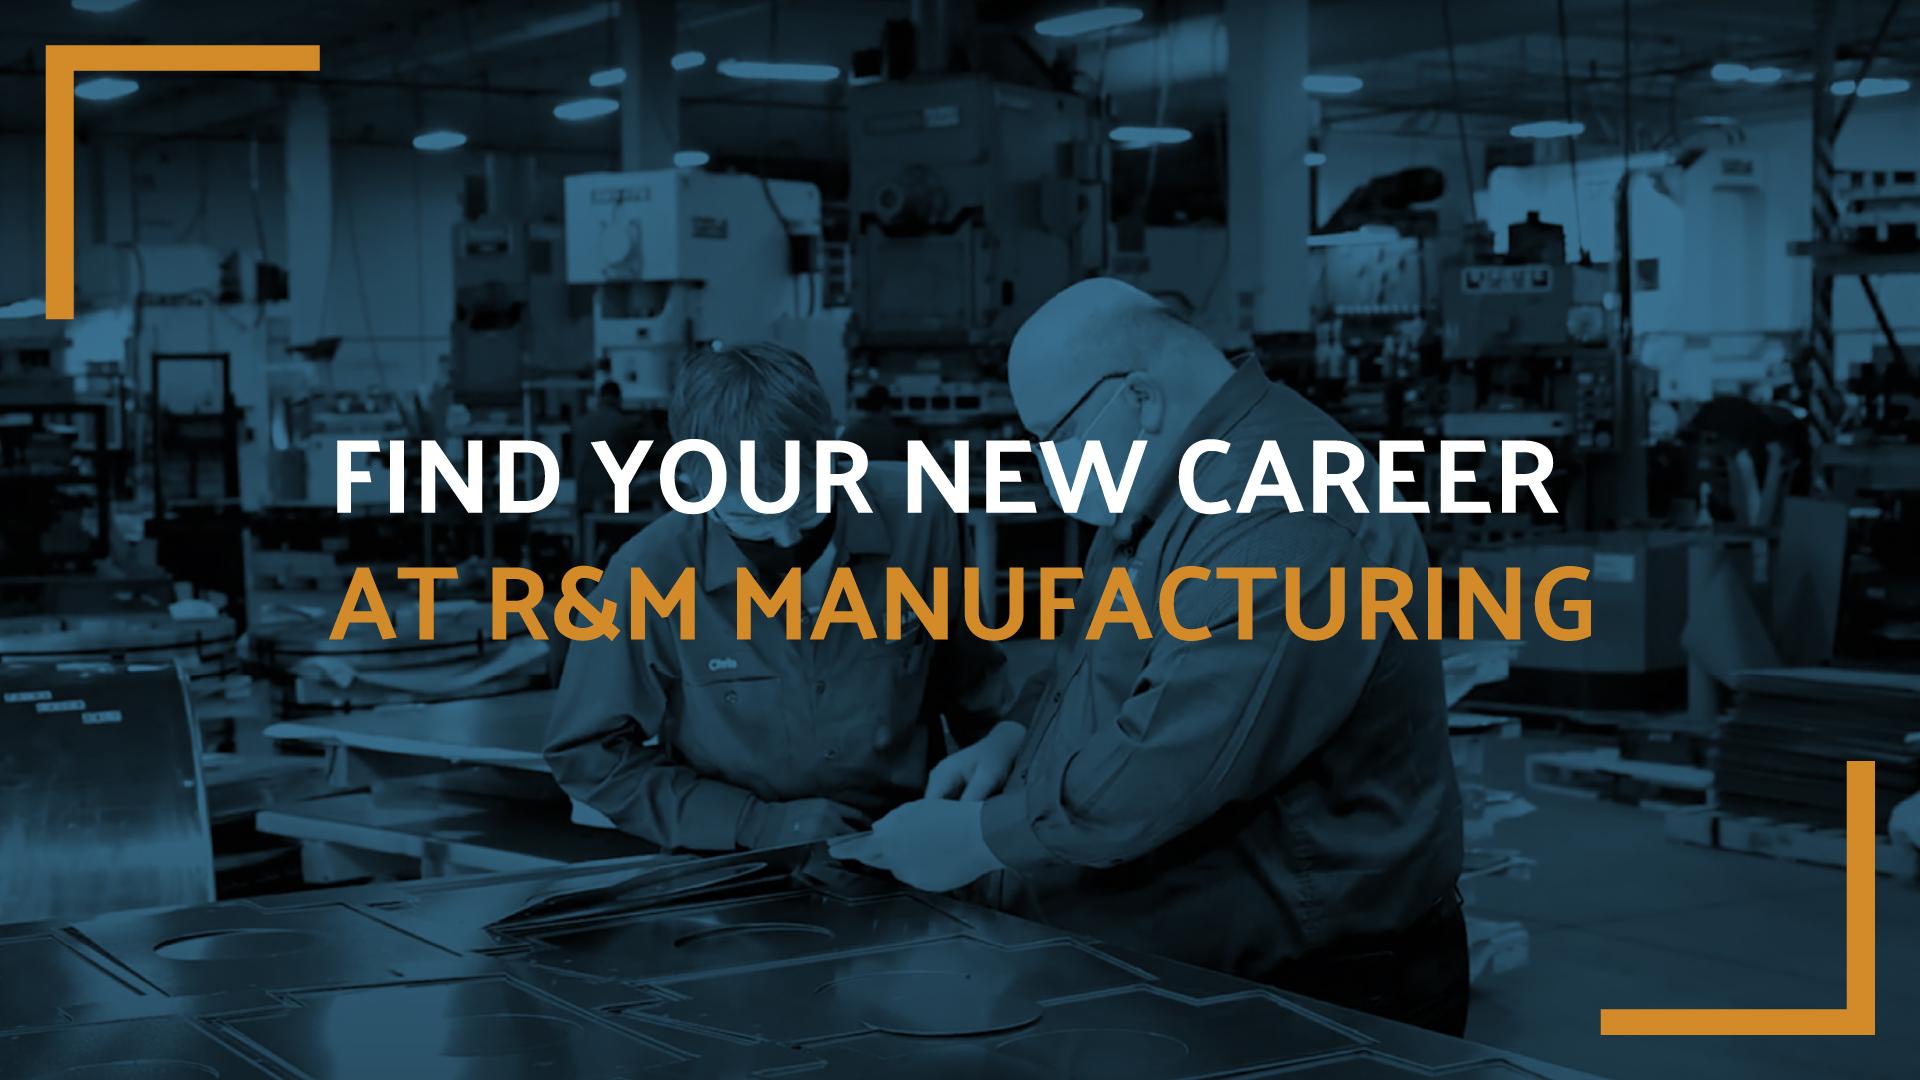 R&M-Recruitment-Video-3-17-21